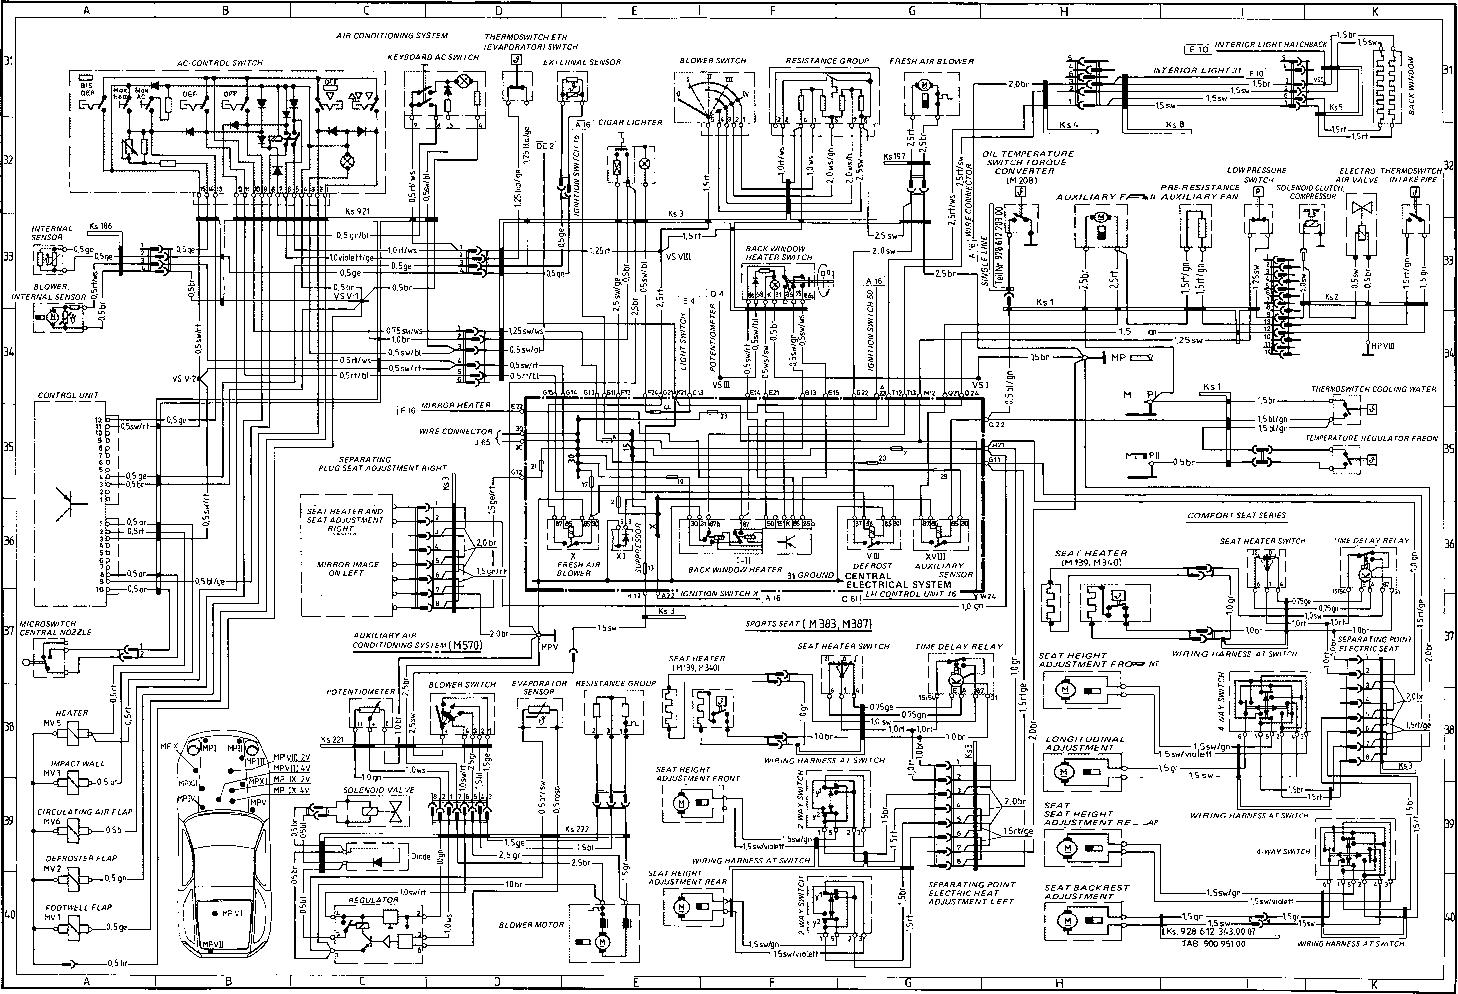 wrg 1757 1983 porsche 911 wiring diagram. Black Bedroom Furniture Sets. Home Design Ideas